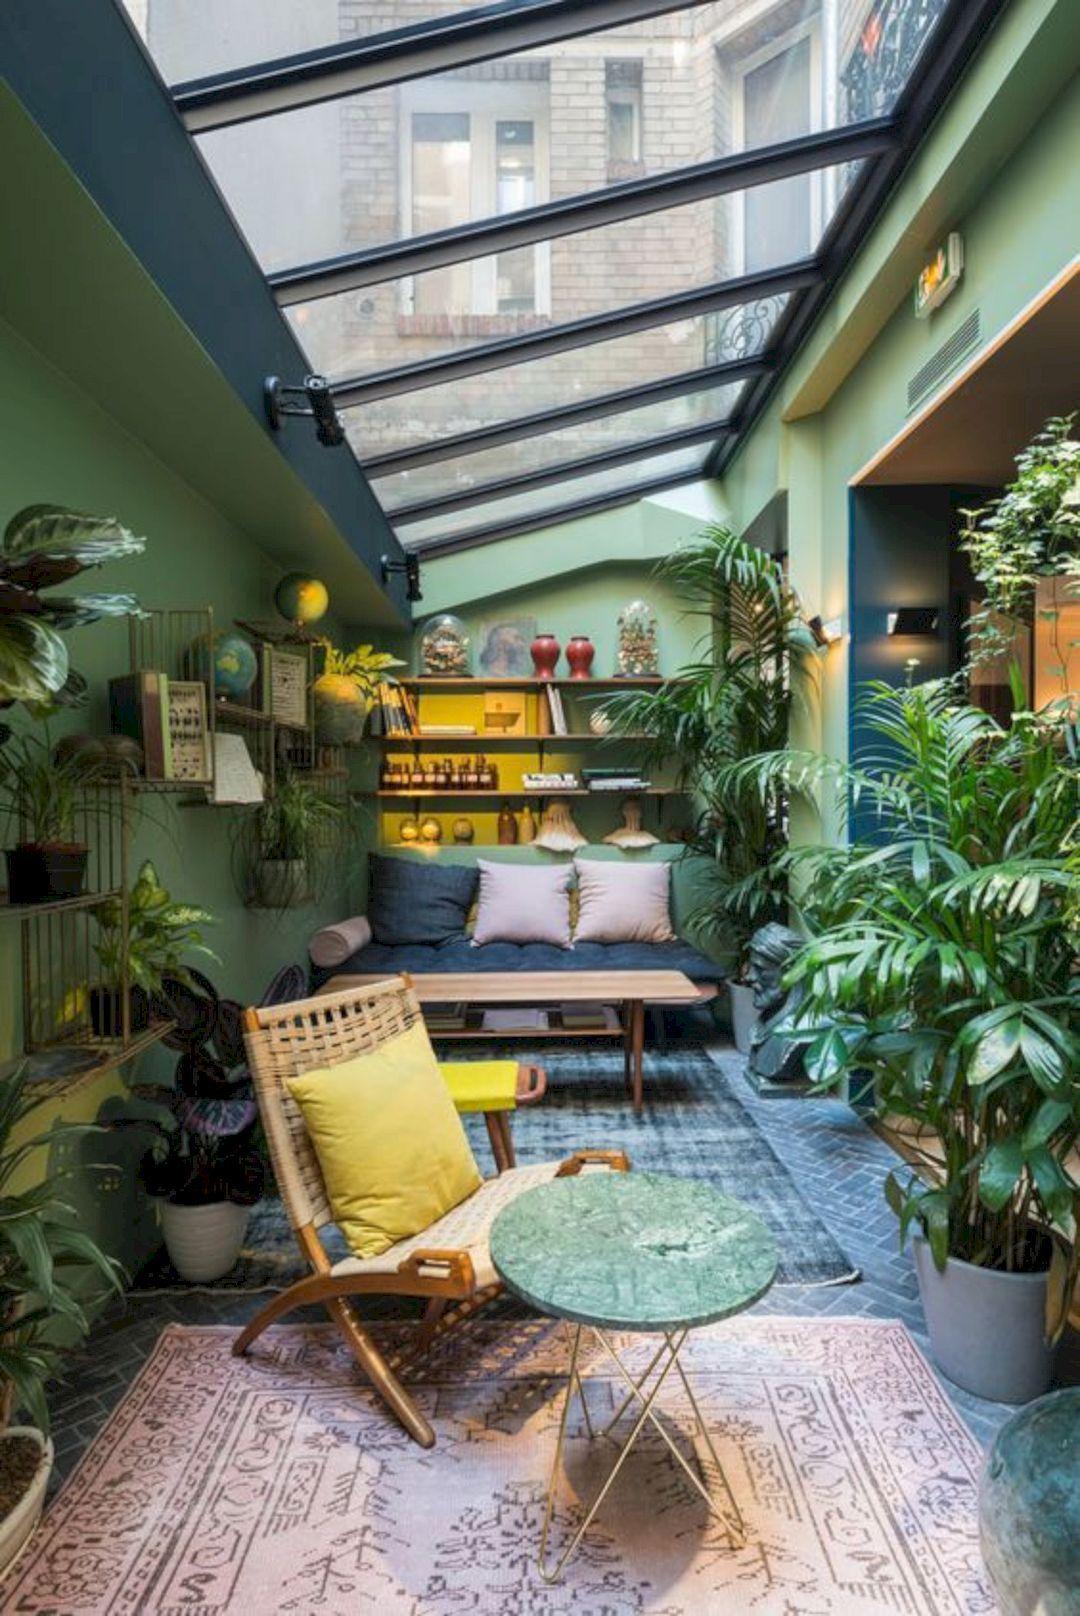 diy eclectic home decors room ideas pinterest eclectic